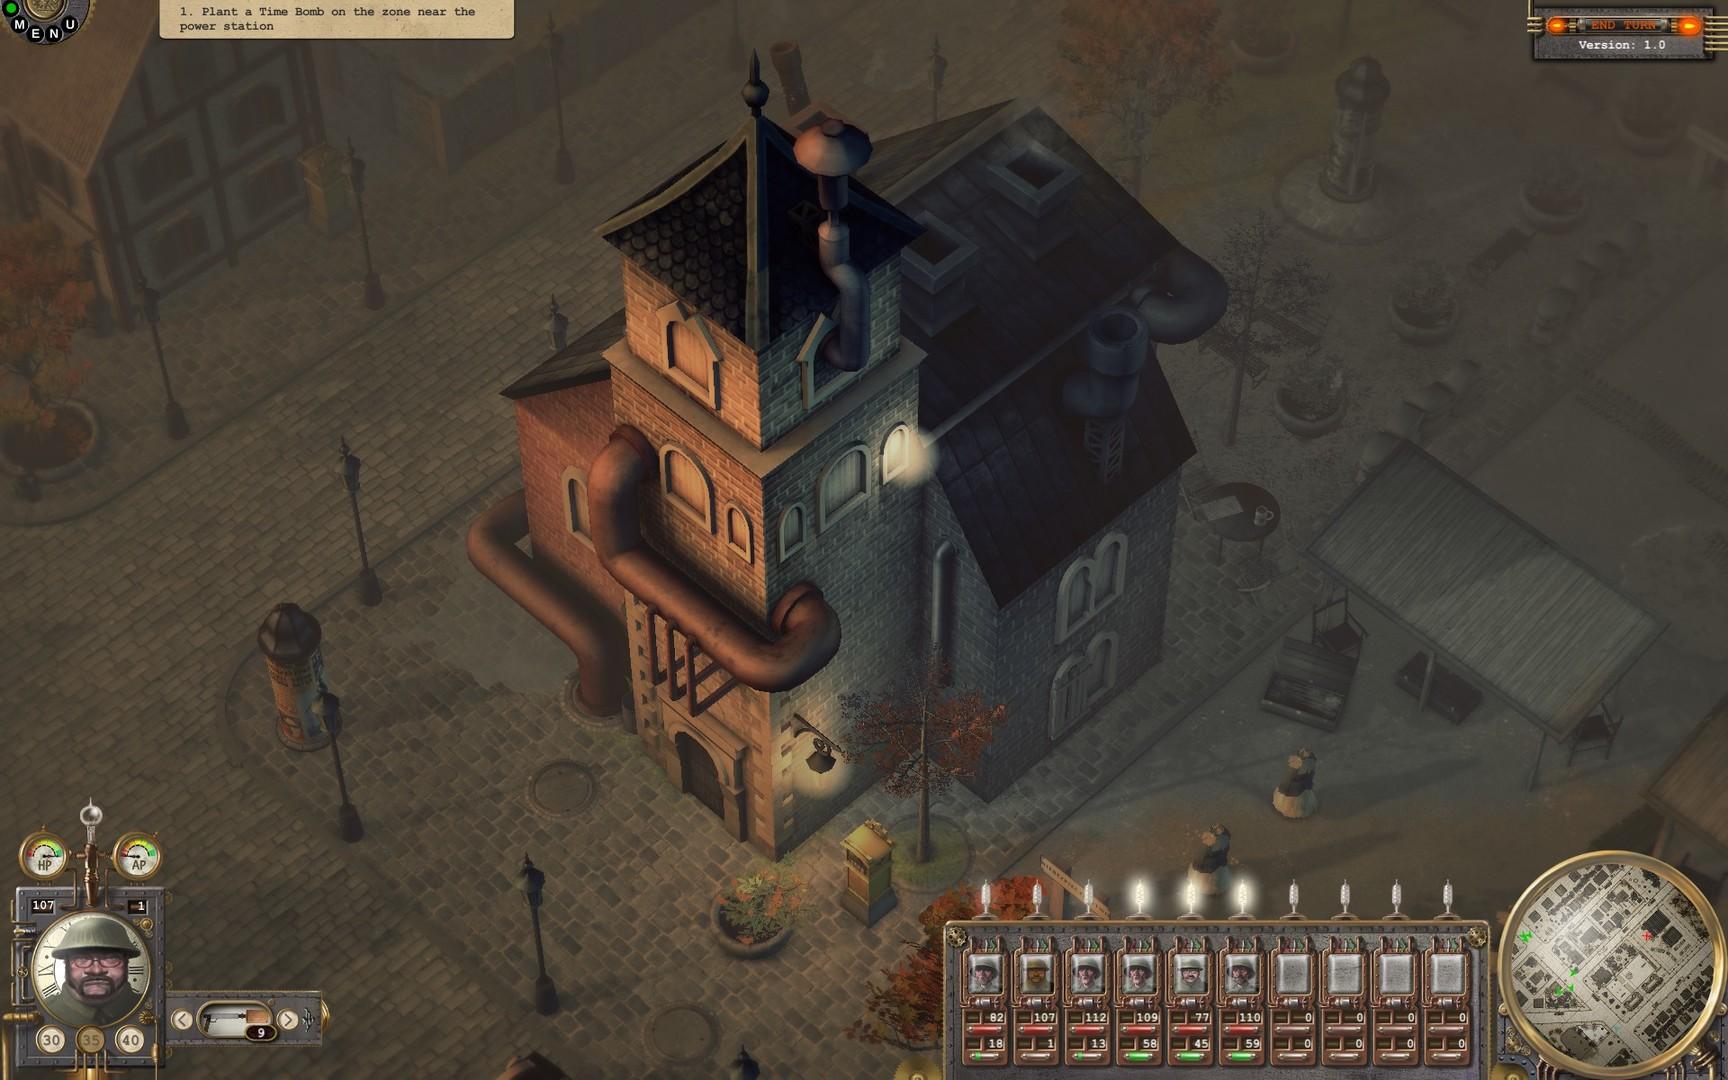 Steam Squad (Bretwalda Games)